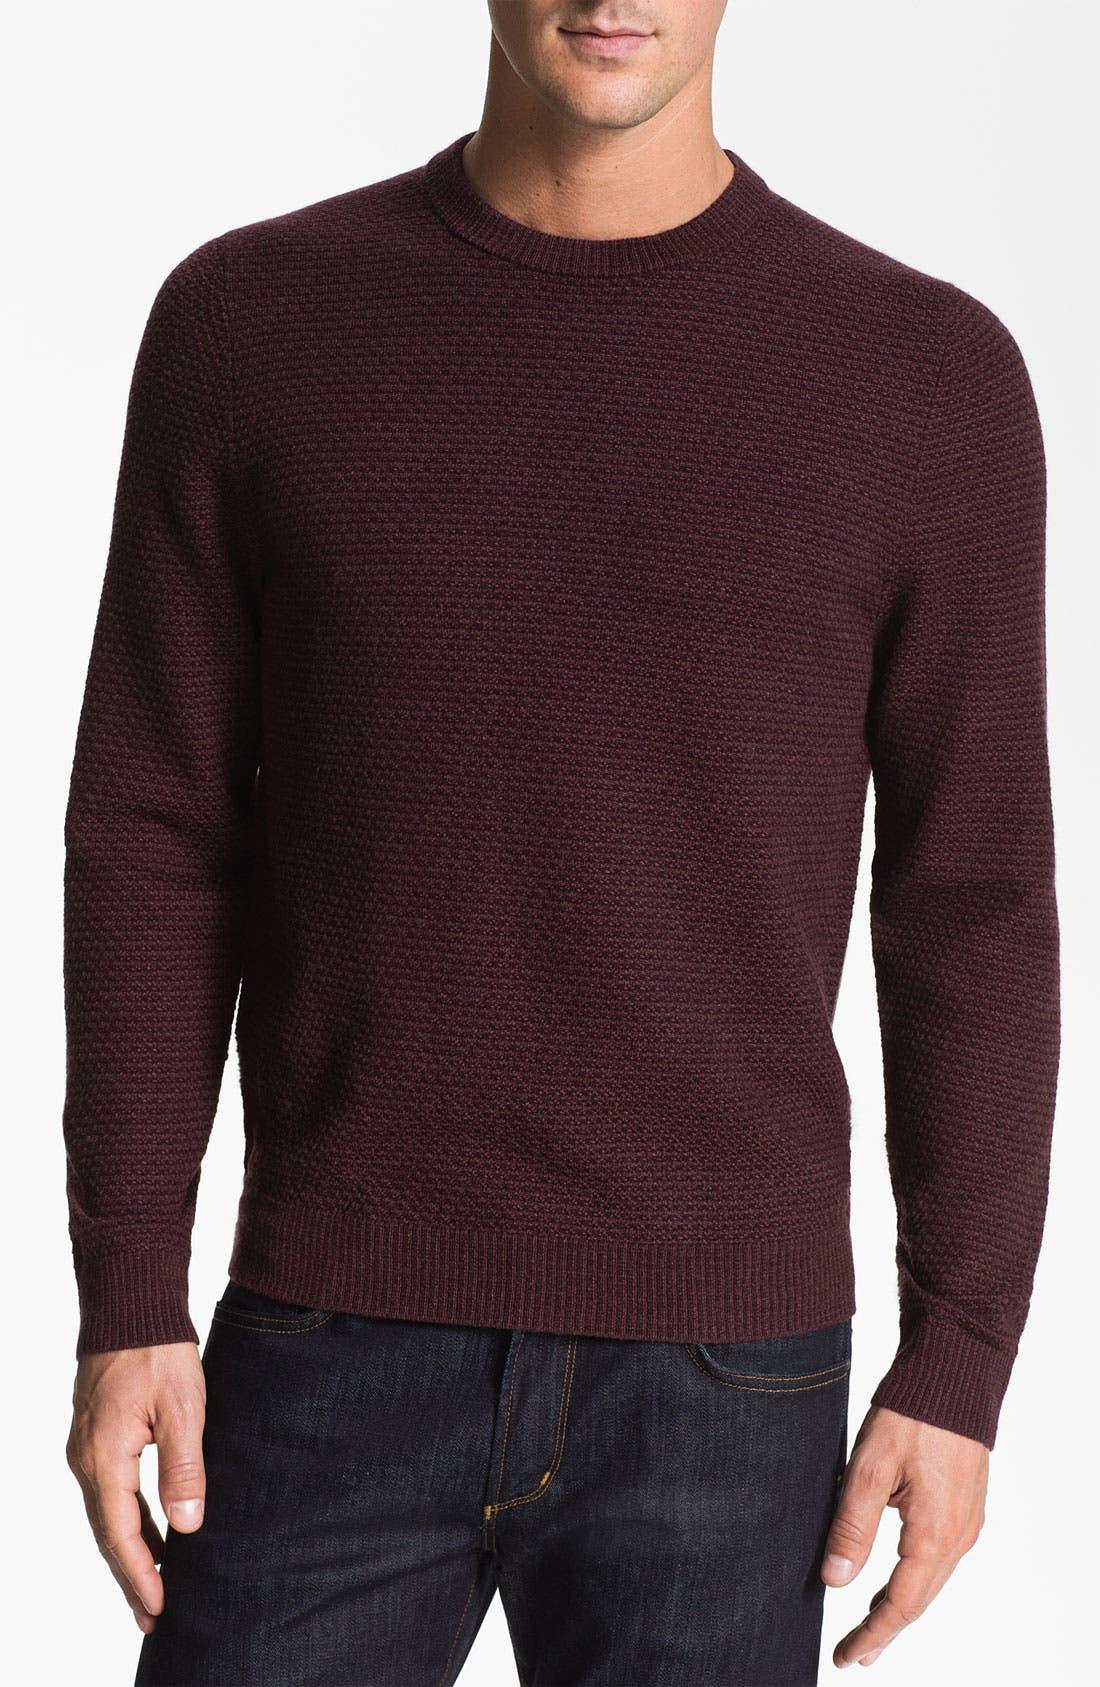 Main Image - Nordstrom Merino Wool Crewneck Sweater